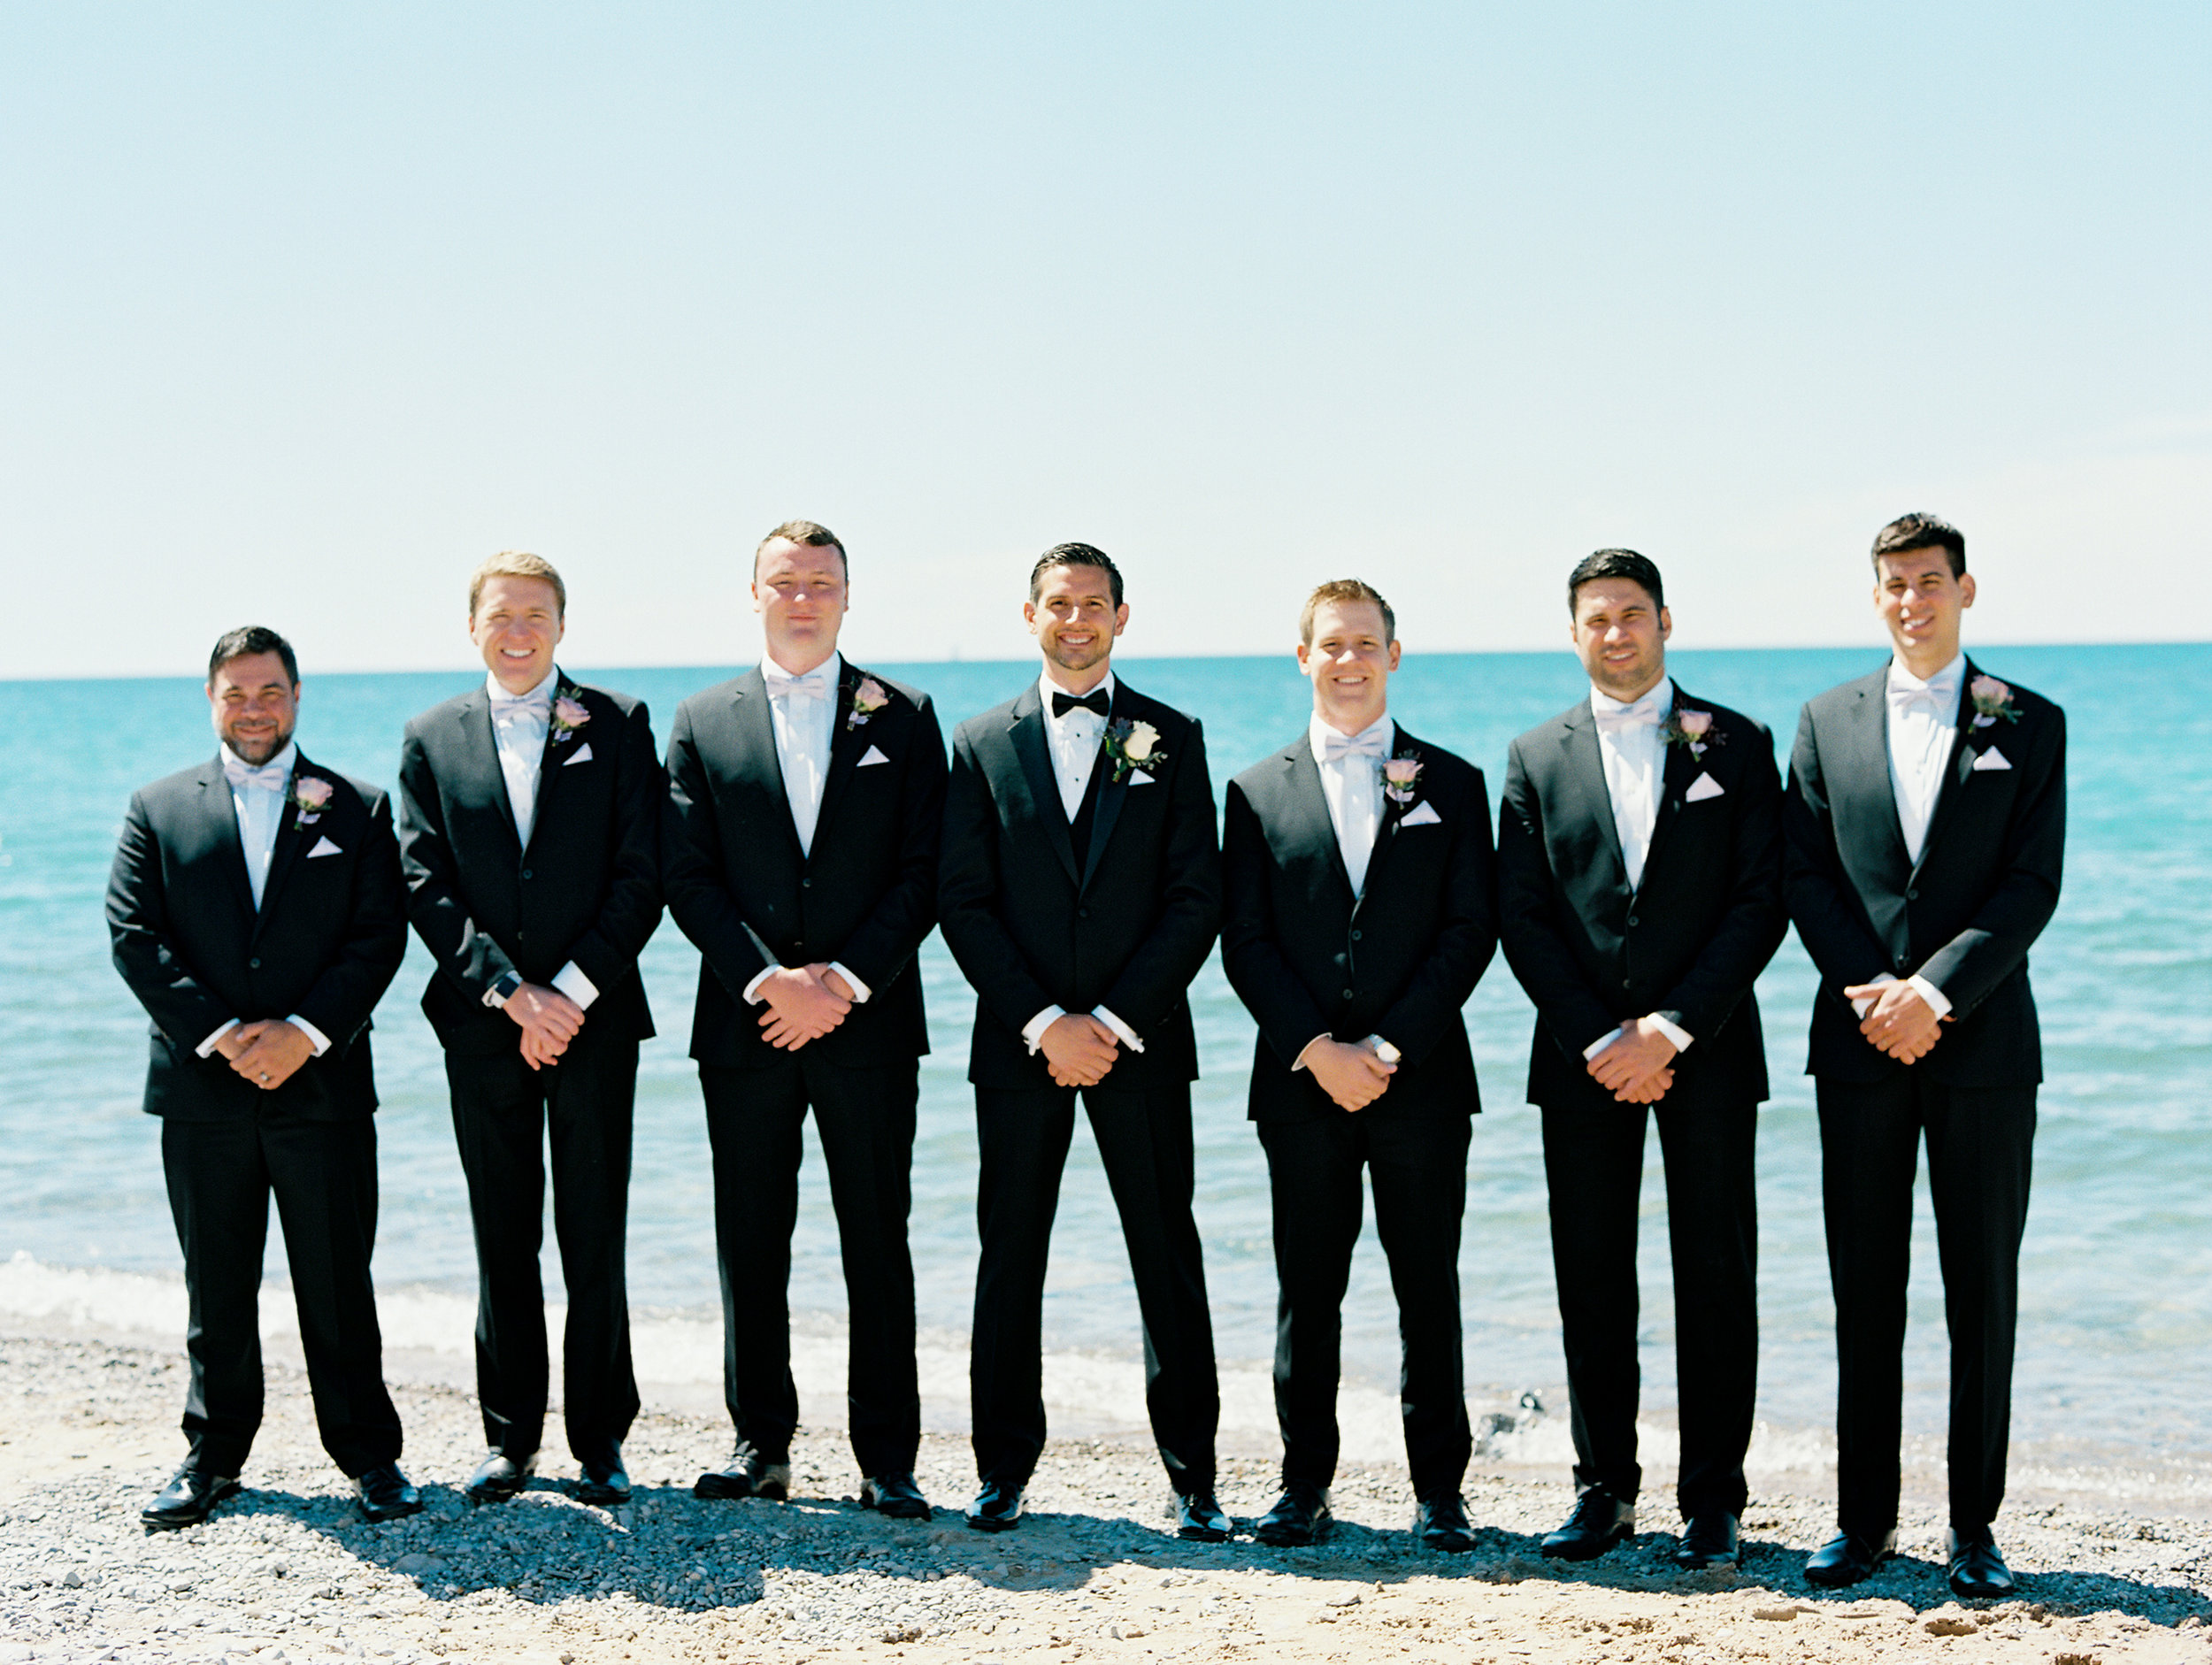 Noss+Wedding+Groom+Groomsmen-36.jpg